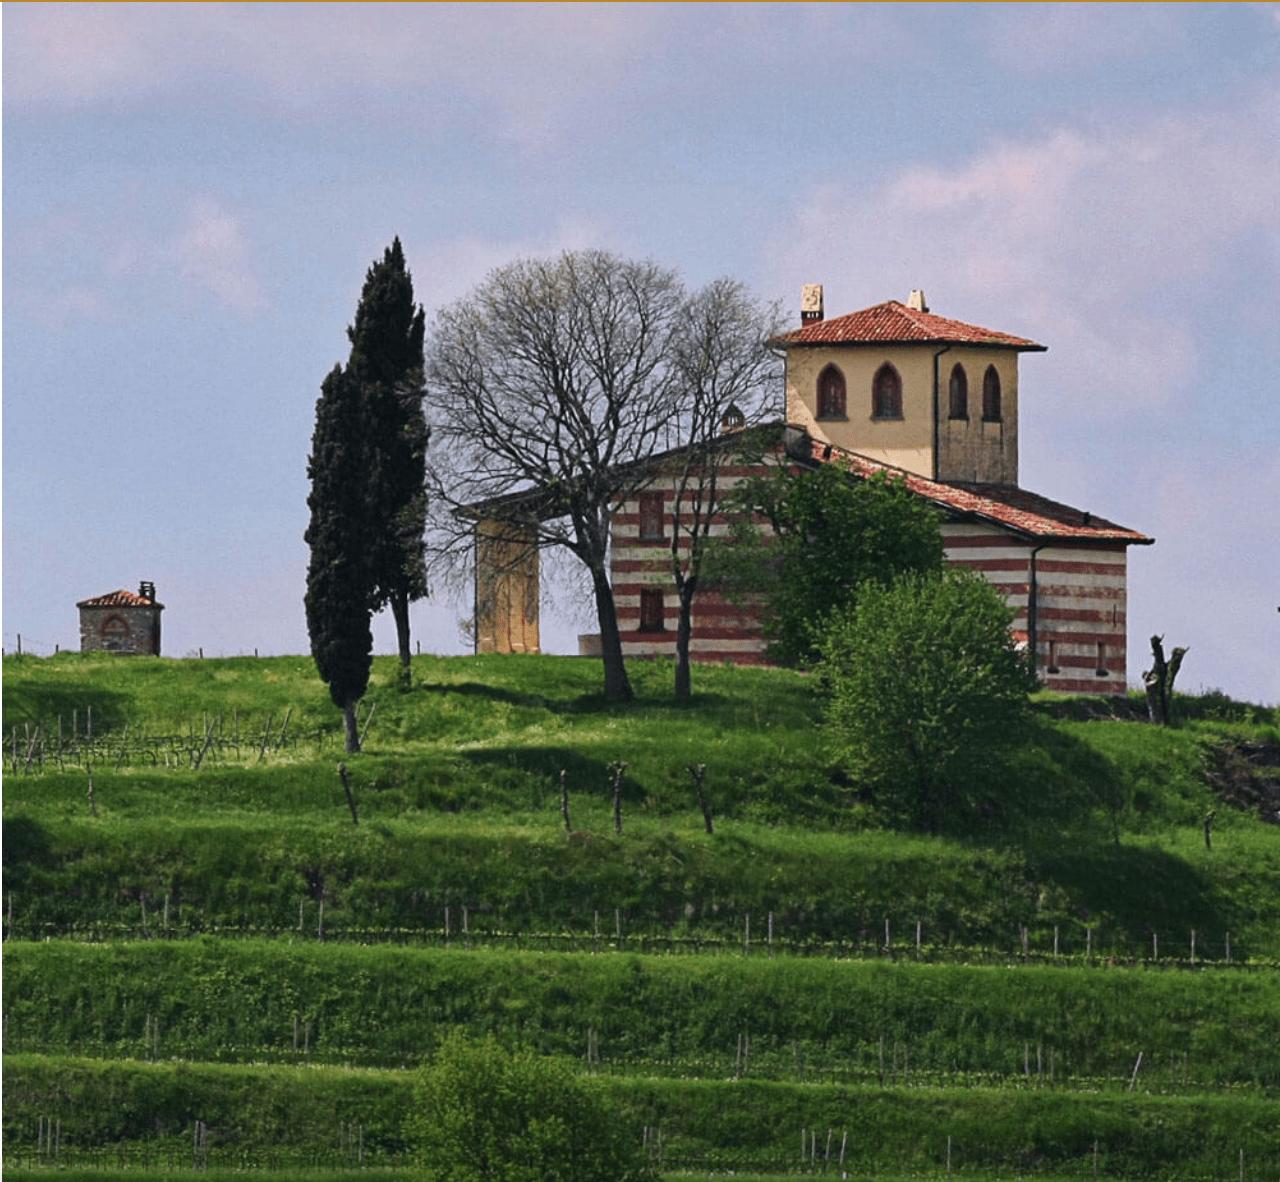 Guido Berlucchi Franciacorta wine